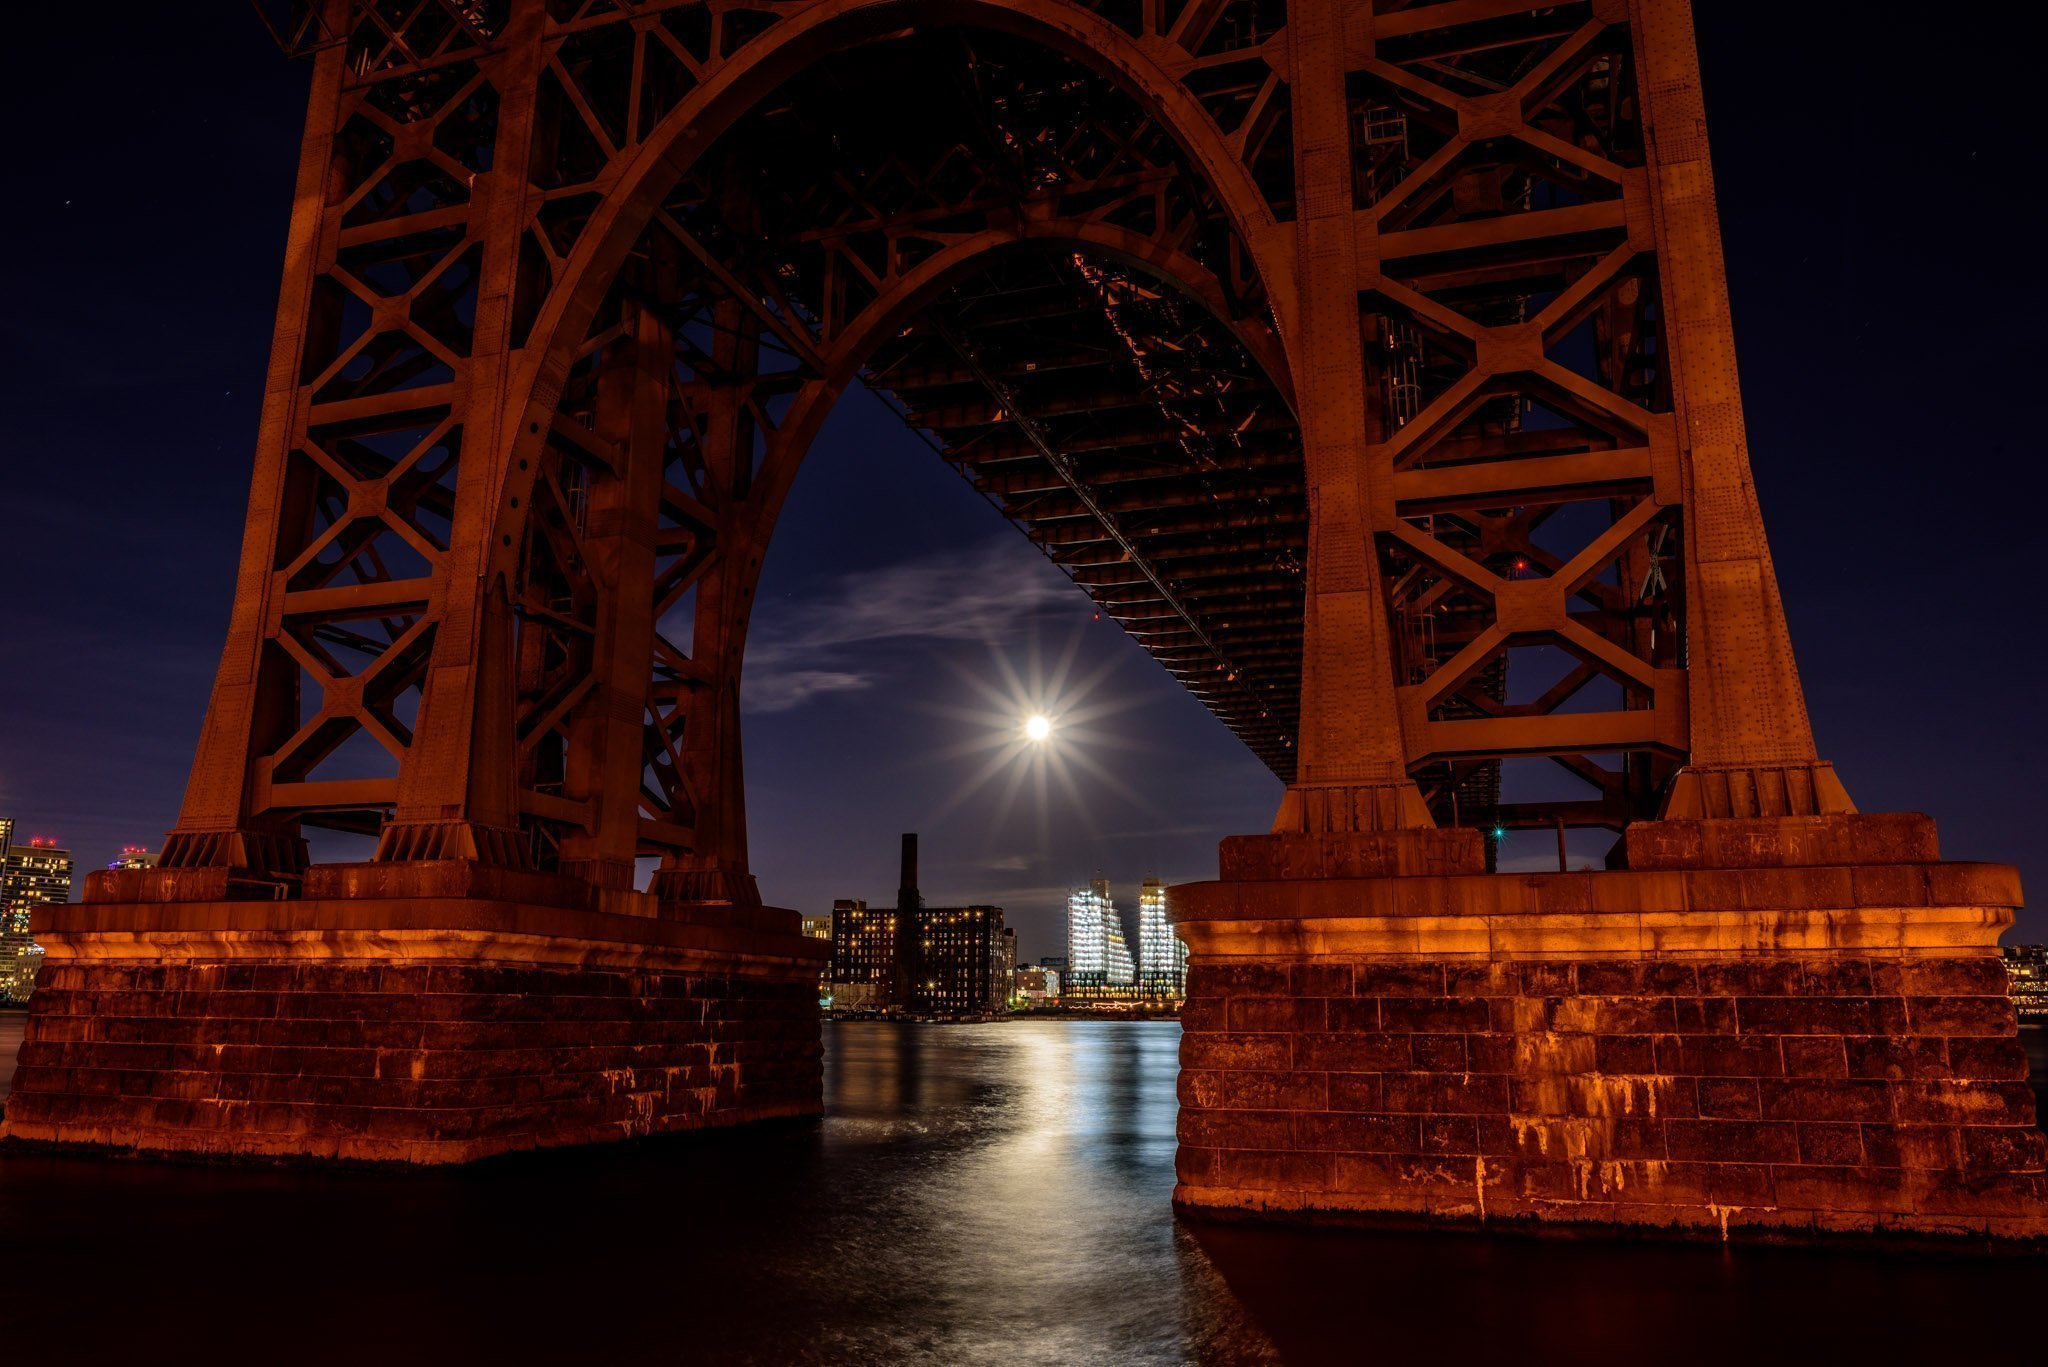 full moon and the Williamsburg Bridge